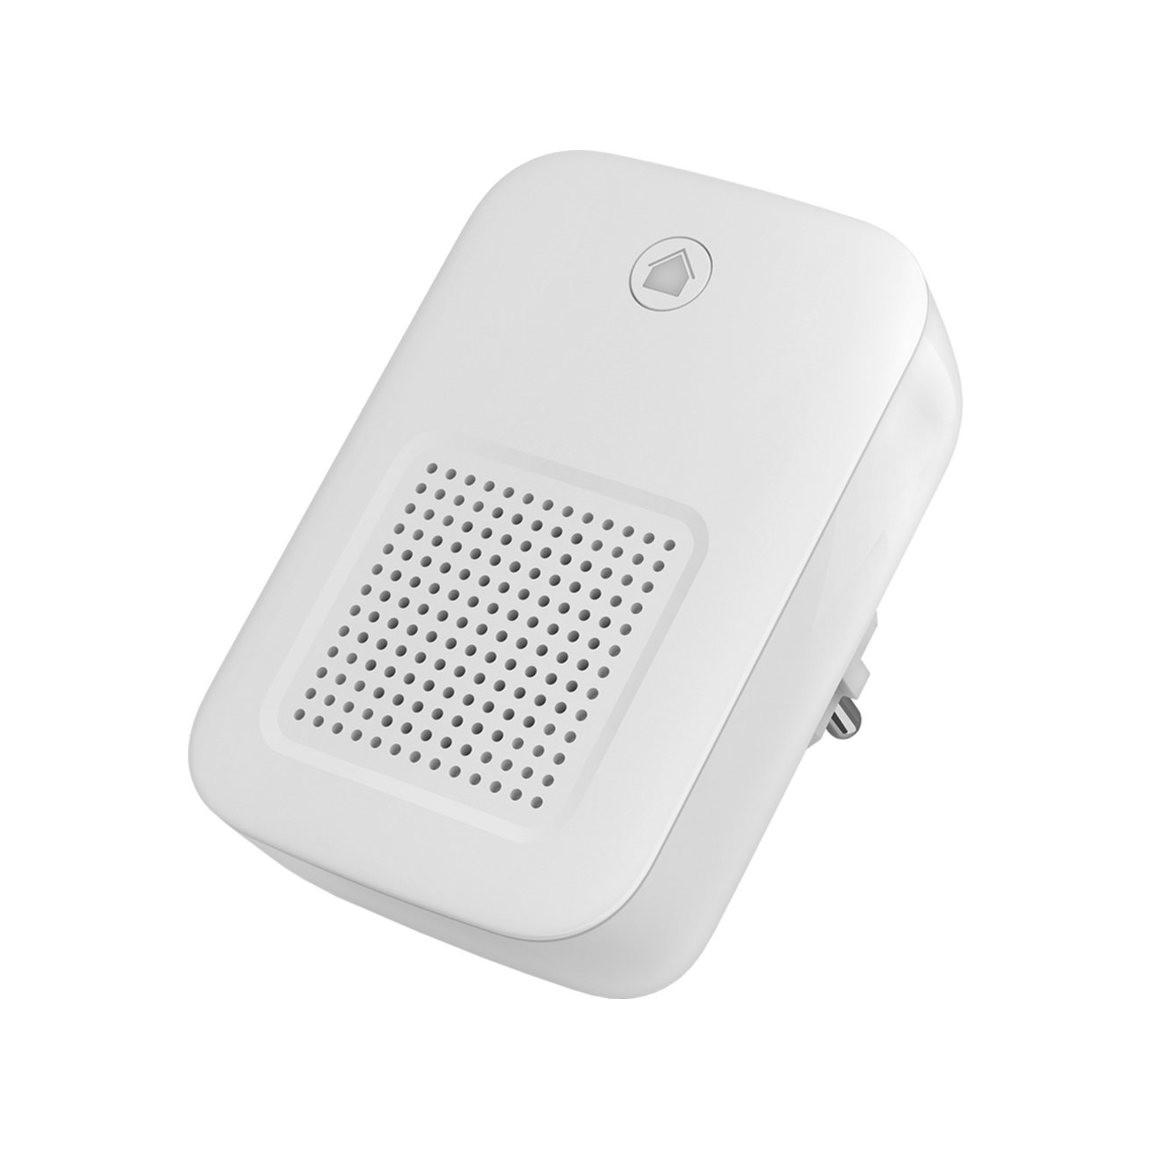 Telekom SmartHome Sirene innen - Weiß